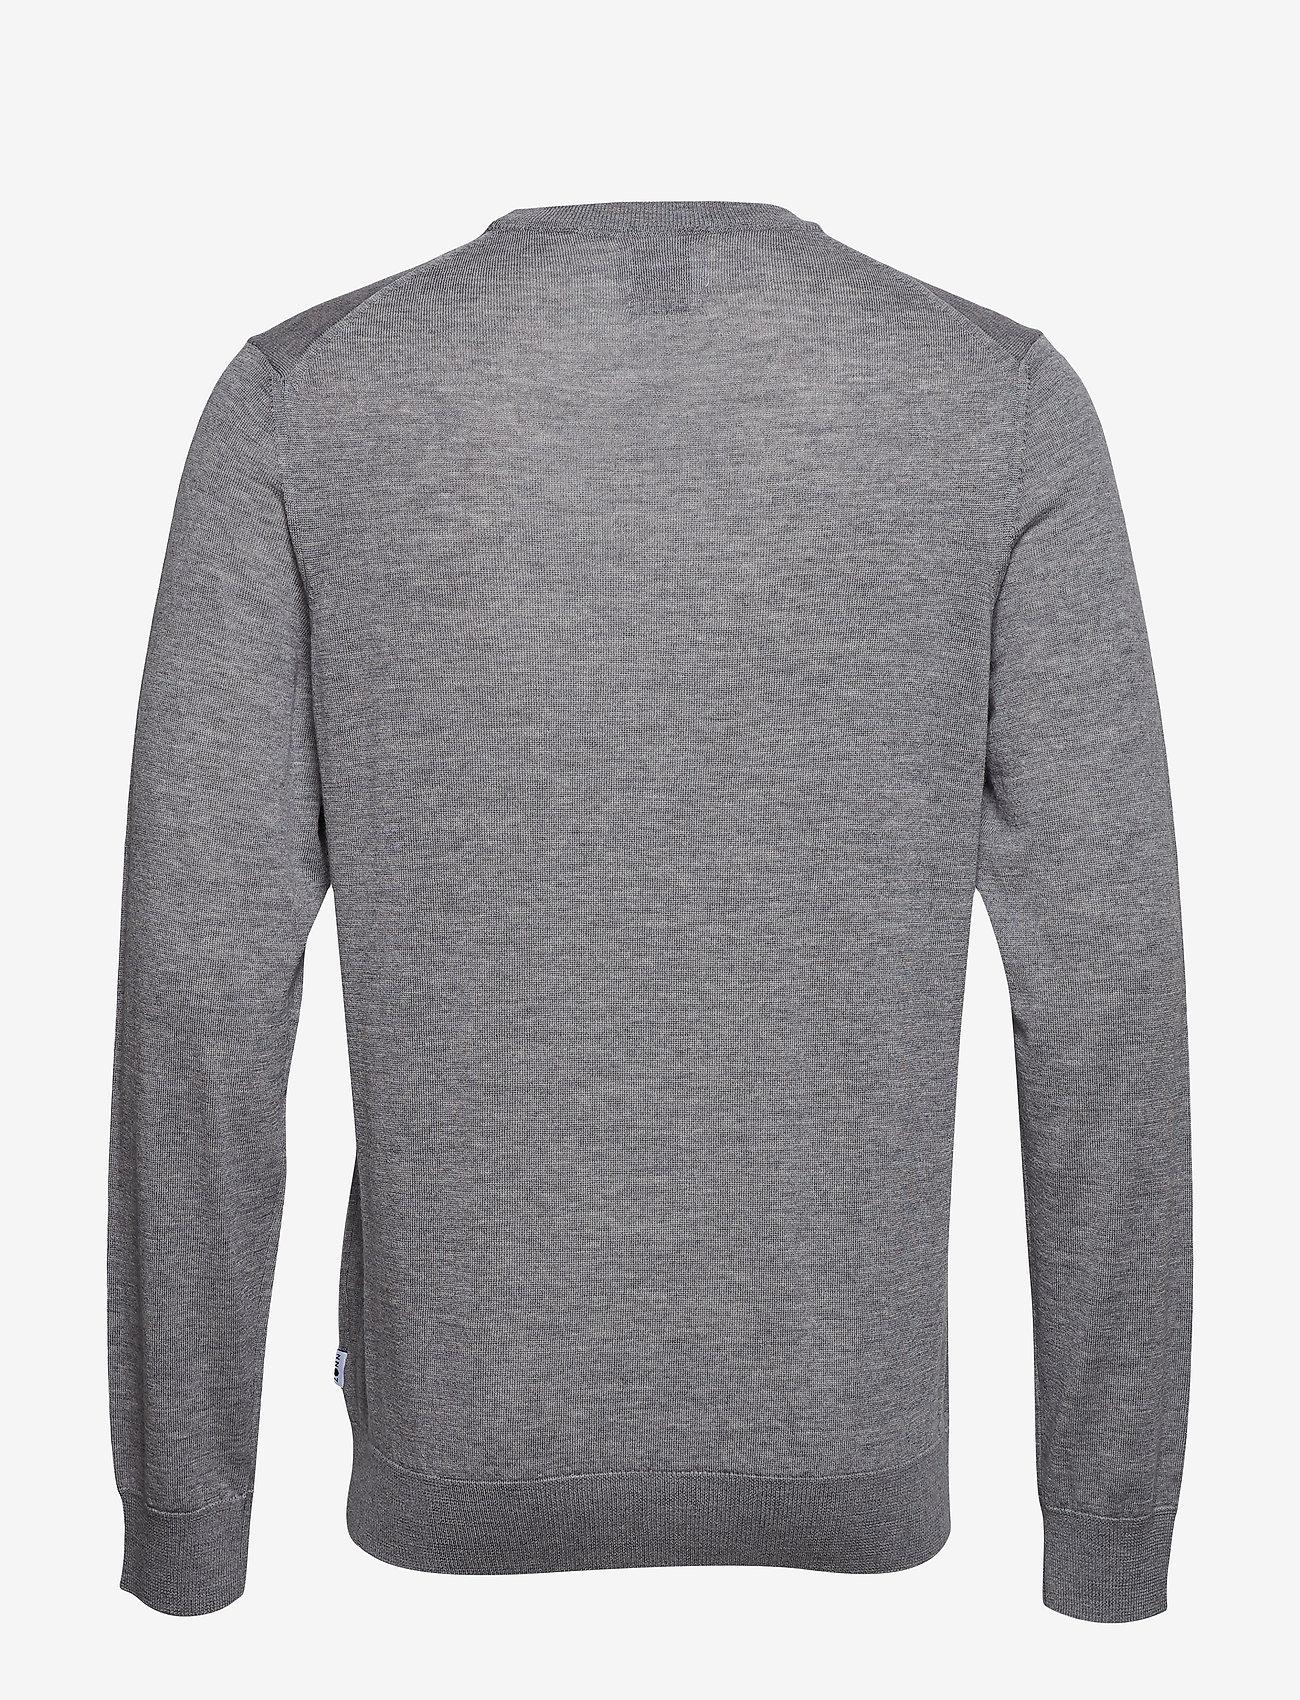 NN07 - Ted 6120 - tricots basiques - medium grey melange - 1